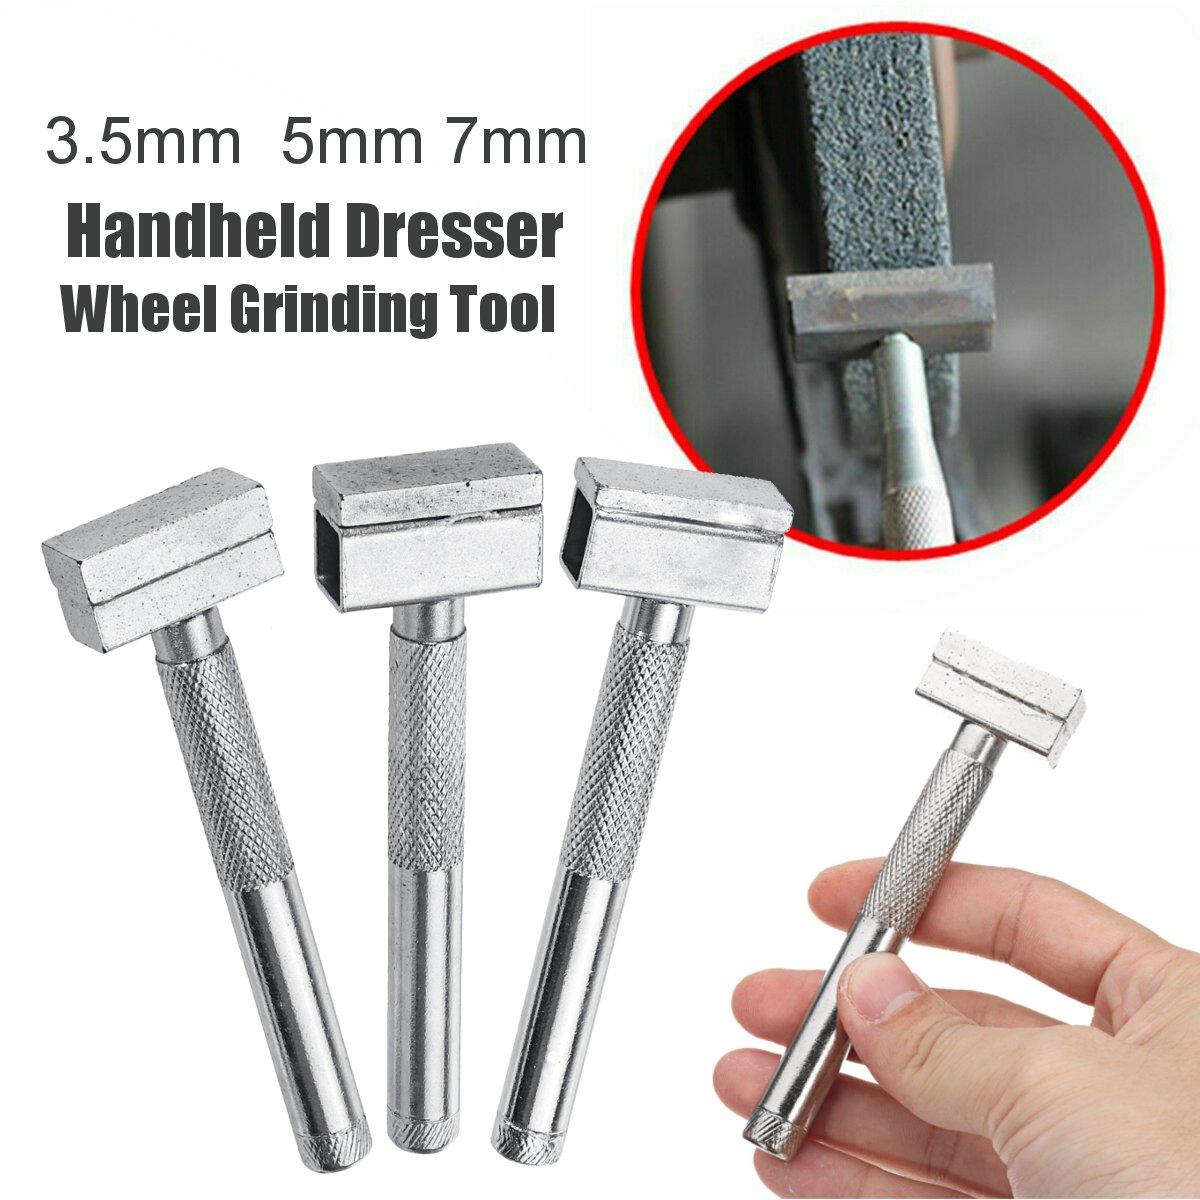 Diamond Grinding Wheel Stone Dresser Tools Handheld Bench Grinder Disc Dressing Metal Grinder Stone Grinding Dressing Tool